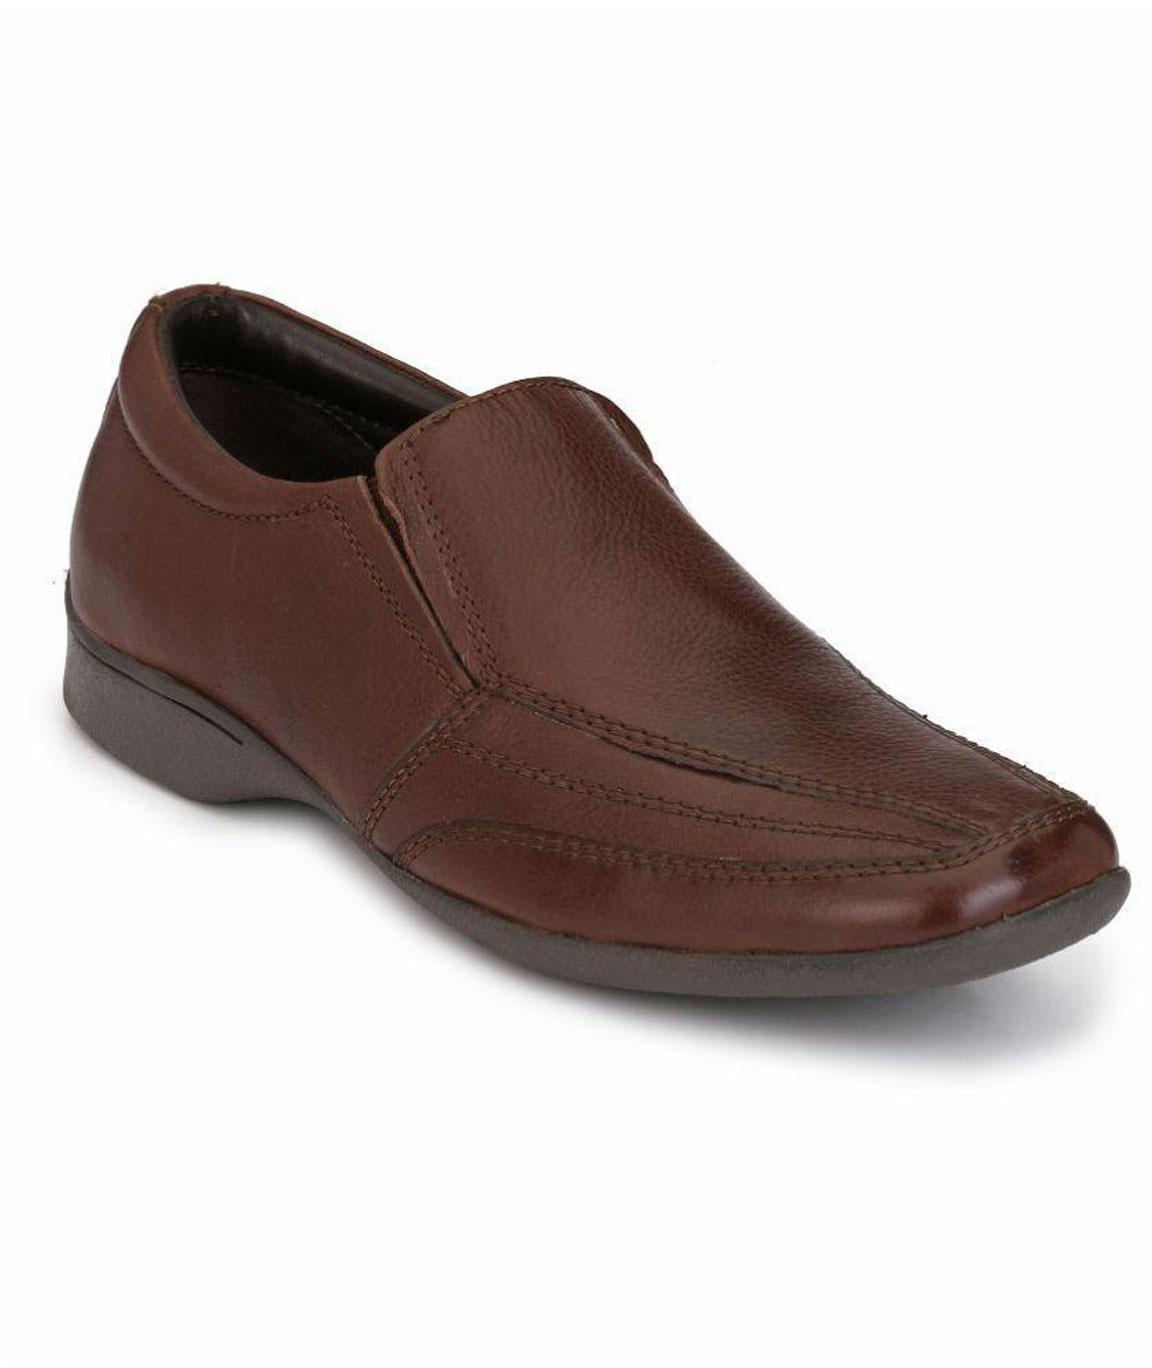 Boggy Confort Brown Formal Shoes